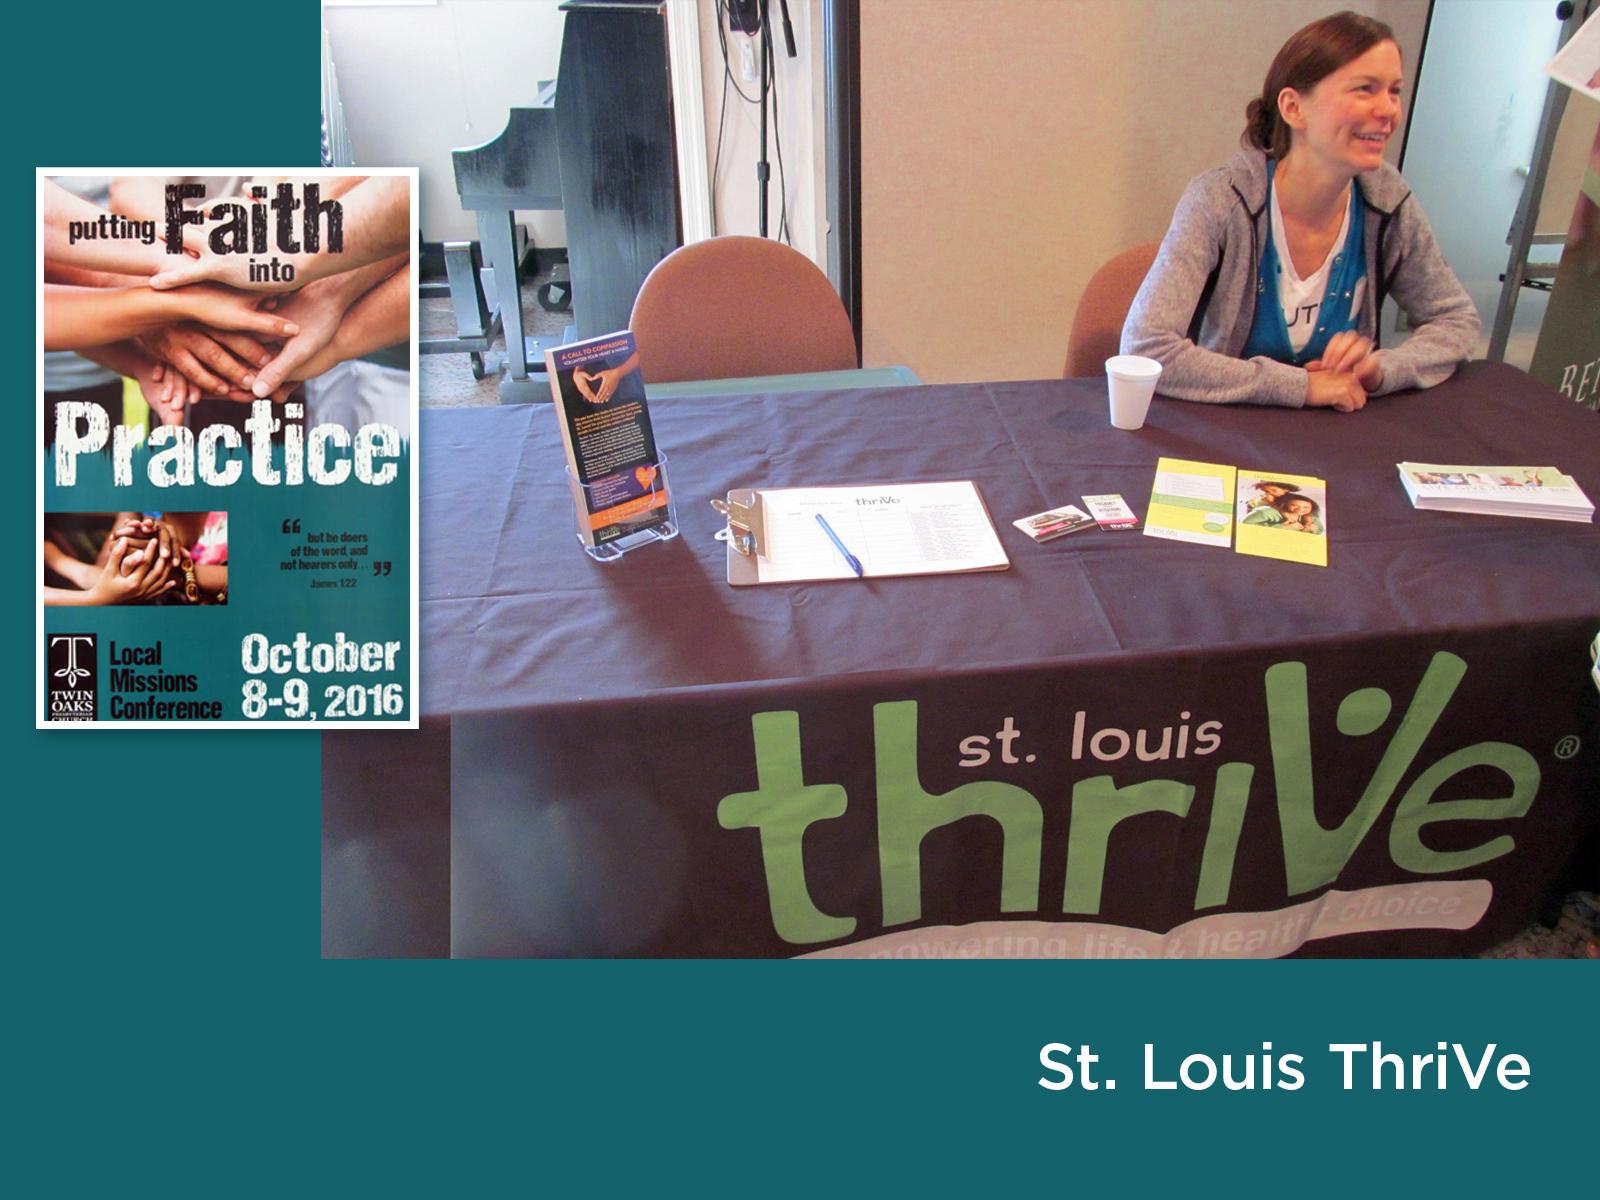 St. Louis ThriVe 1.jpg